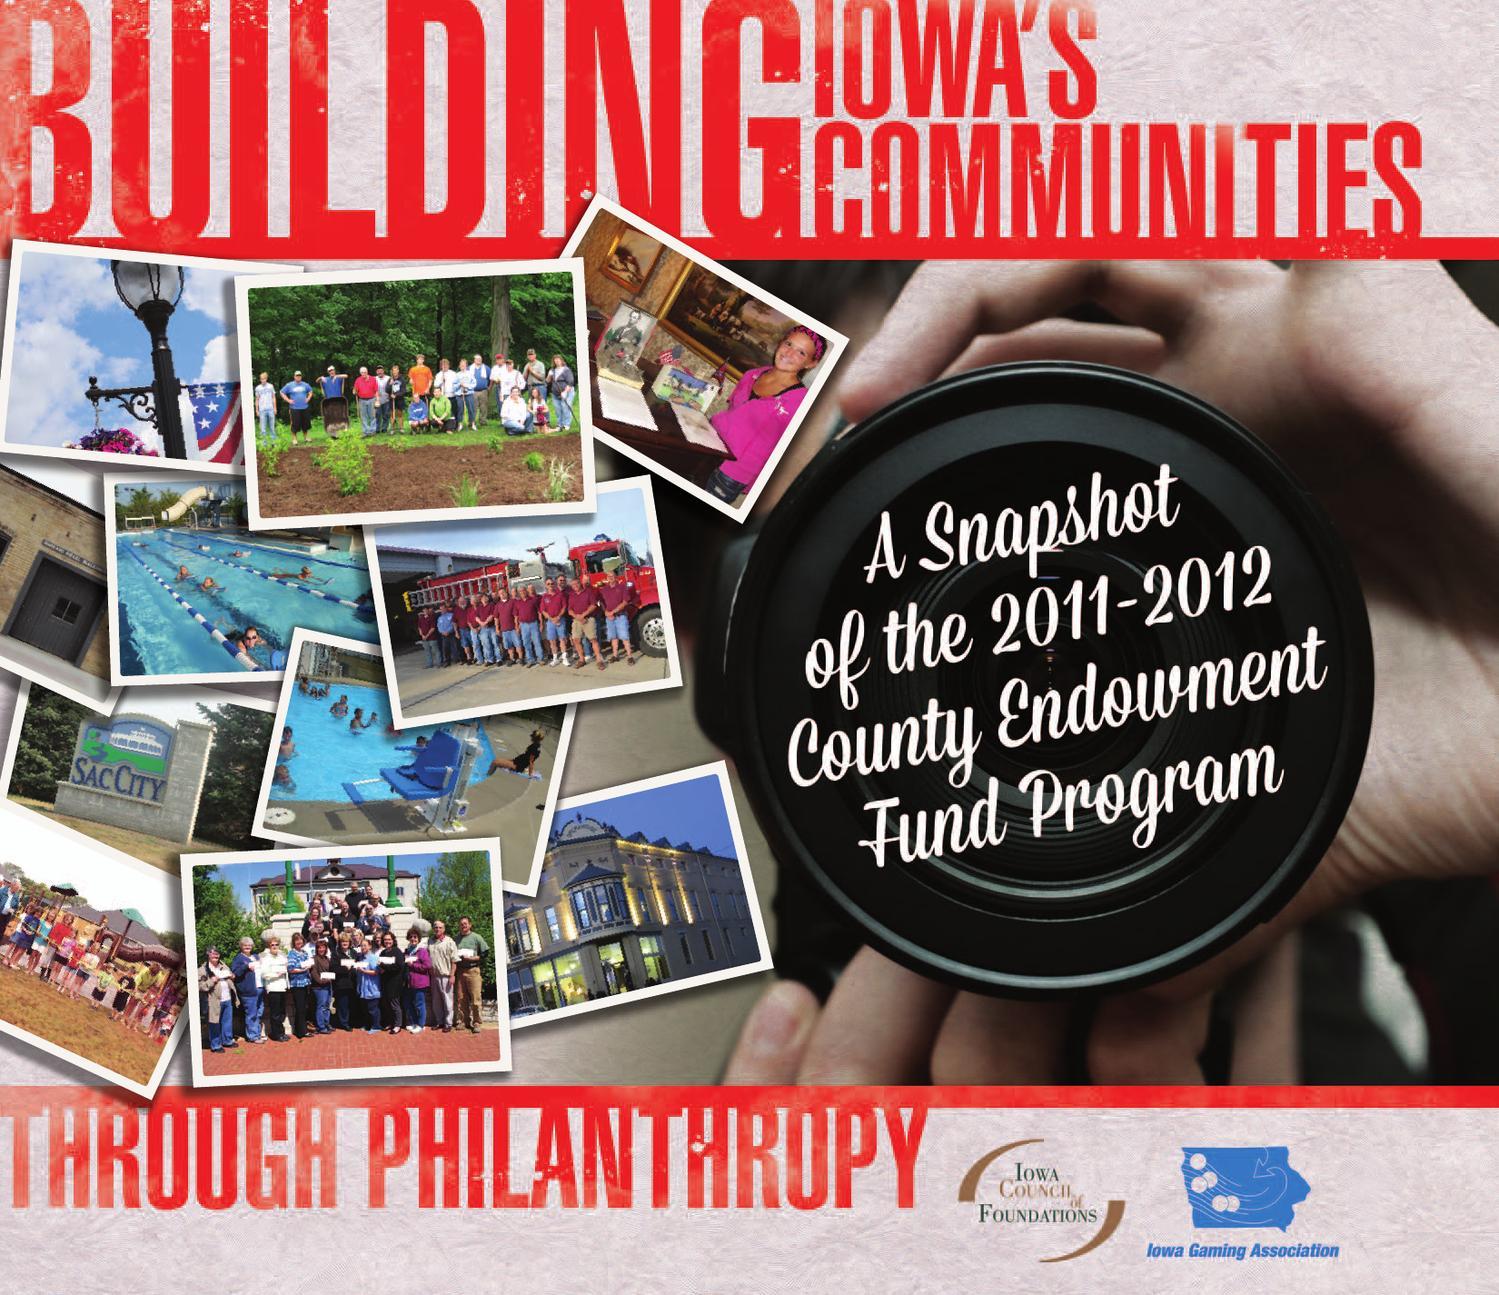 Building Iowas Communities Through Philanthropy The 2011 2012 7 Round Wiring Diagram For Vermeer Trailer County Endowment Program By Angela Dethlefs Trettin Issuu